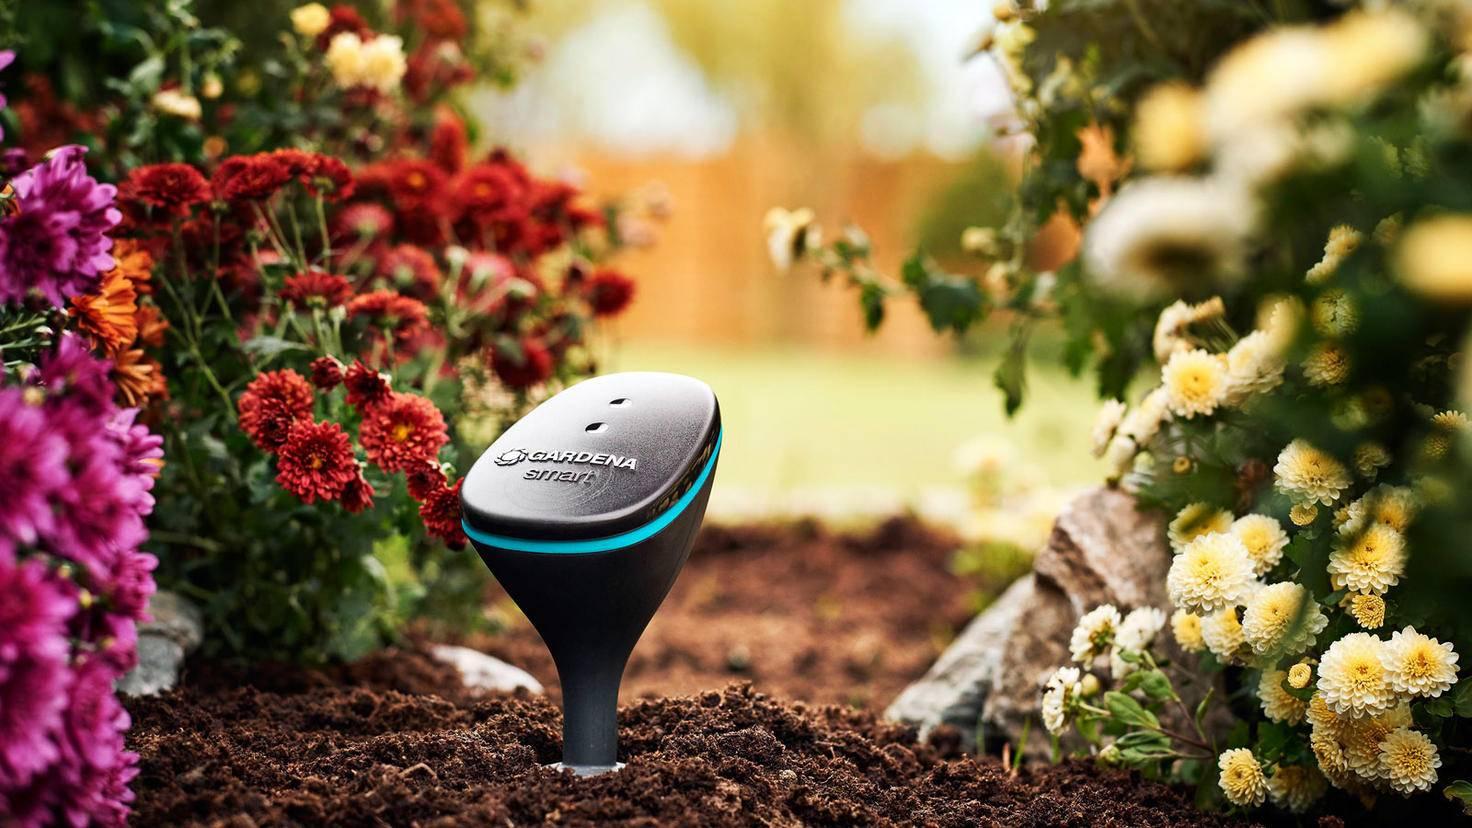 Gardena-Siri-Garten-HomeKit-Gardena